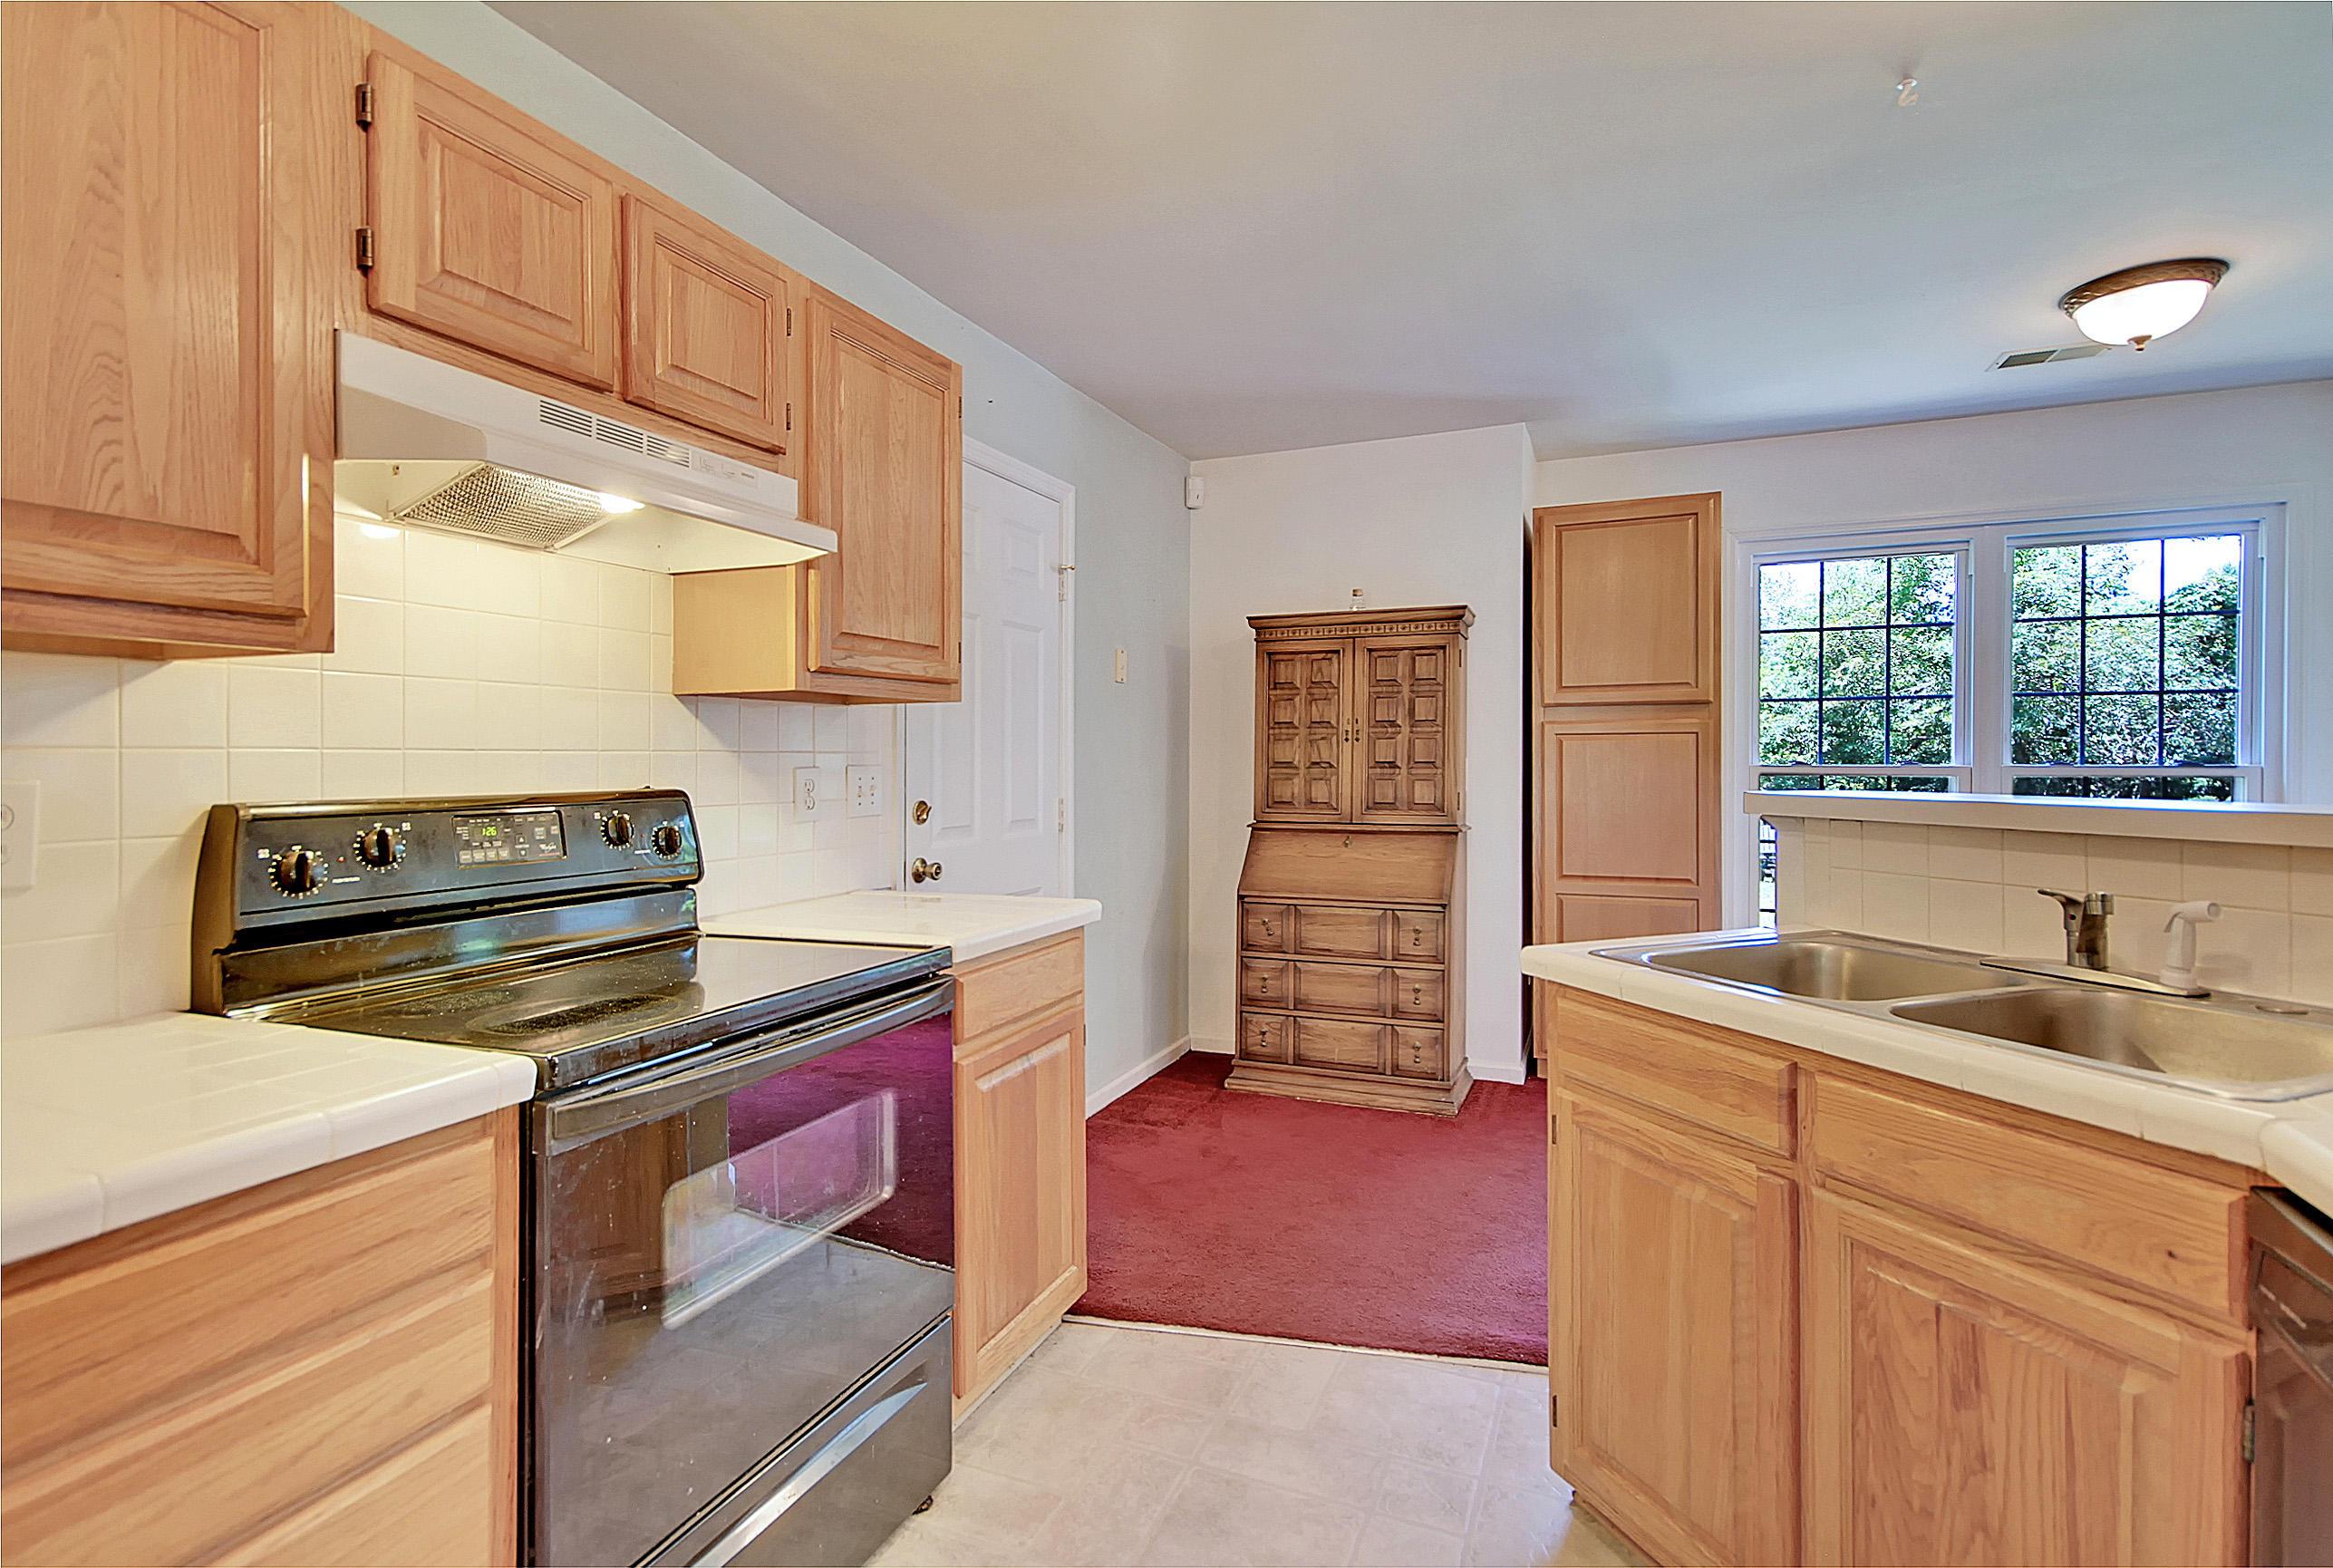 Center Lake Homes For Sale - 1252 Center Lake, Mount Pleasant, SC - 22